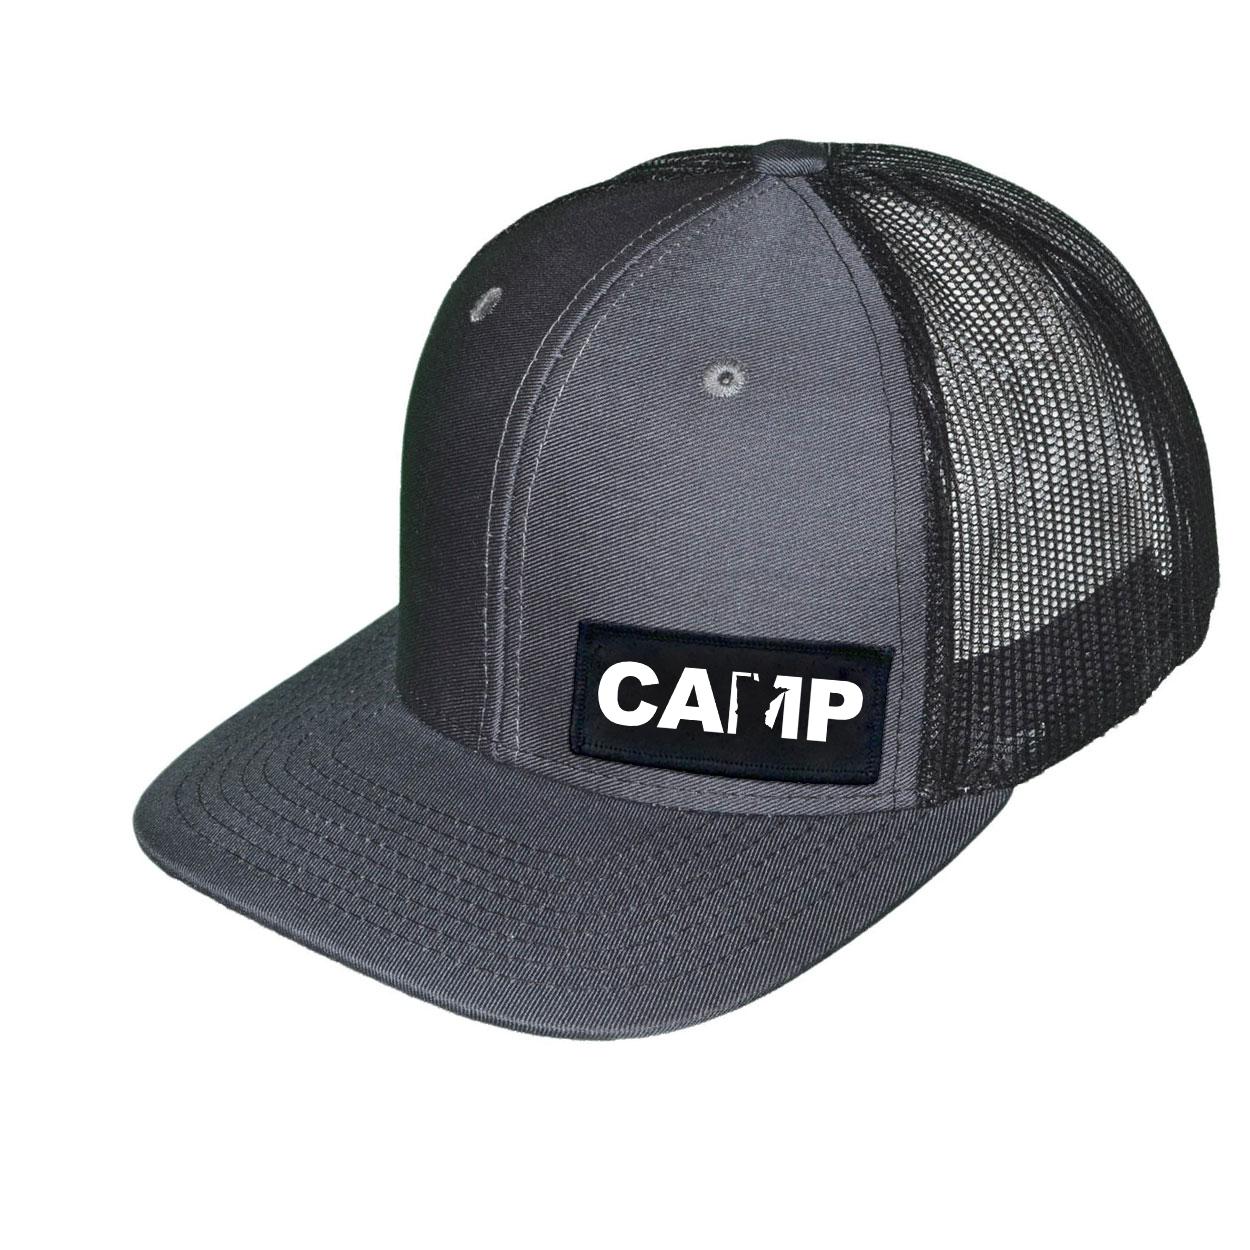 Camp Minnesota Night Out Woven Patch Snapback Trucker Hat Dark Gray/Black (White Logo)